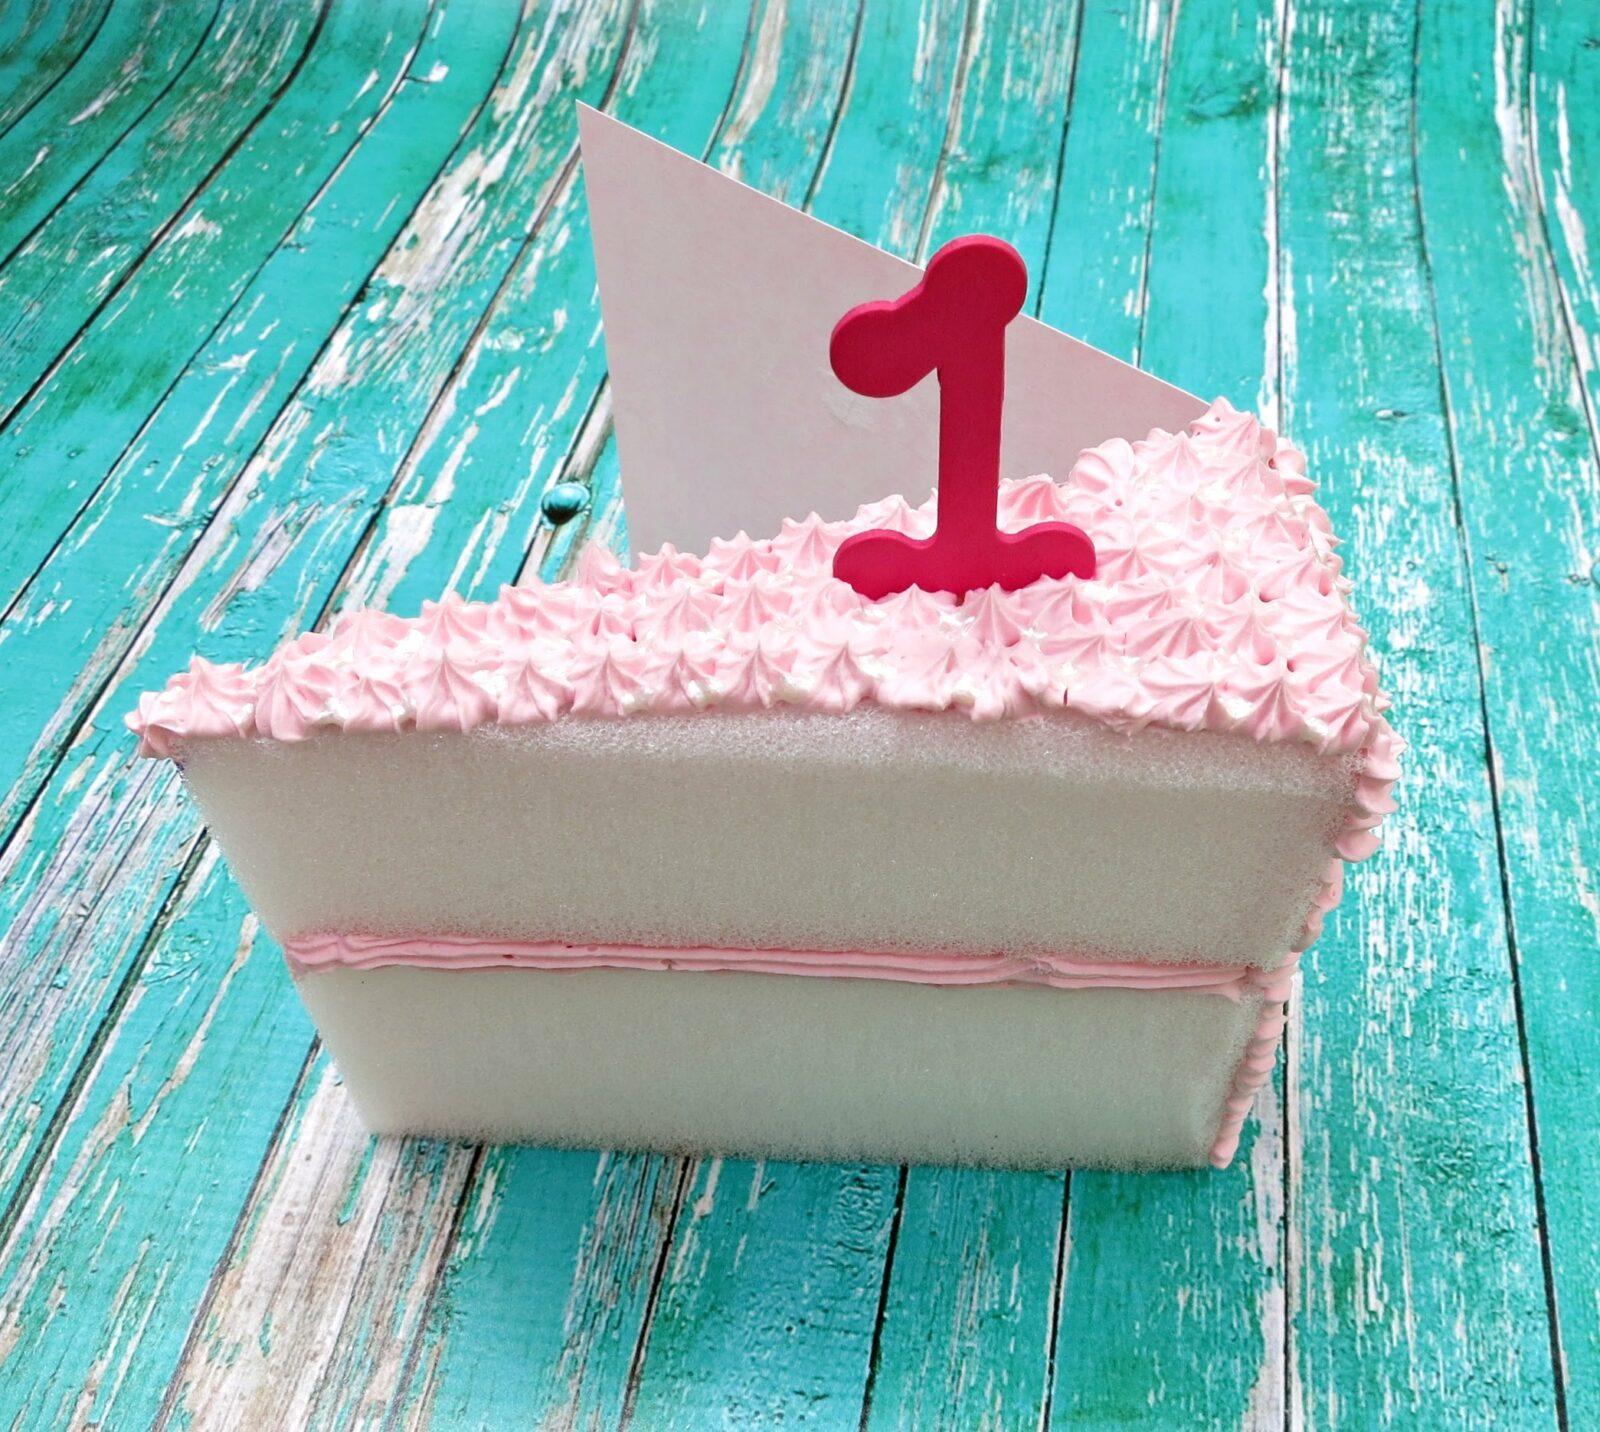 Make A Birthday Card That Looks Like A Cake Slice